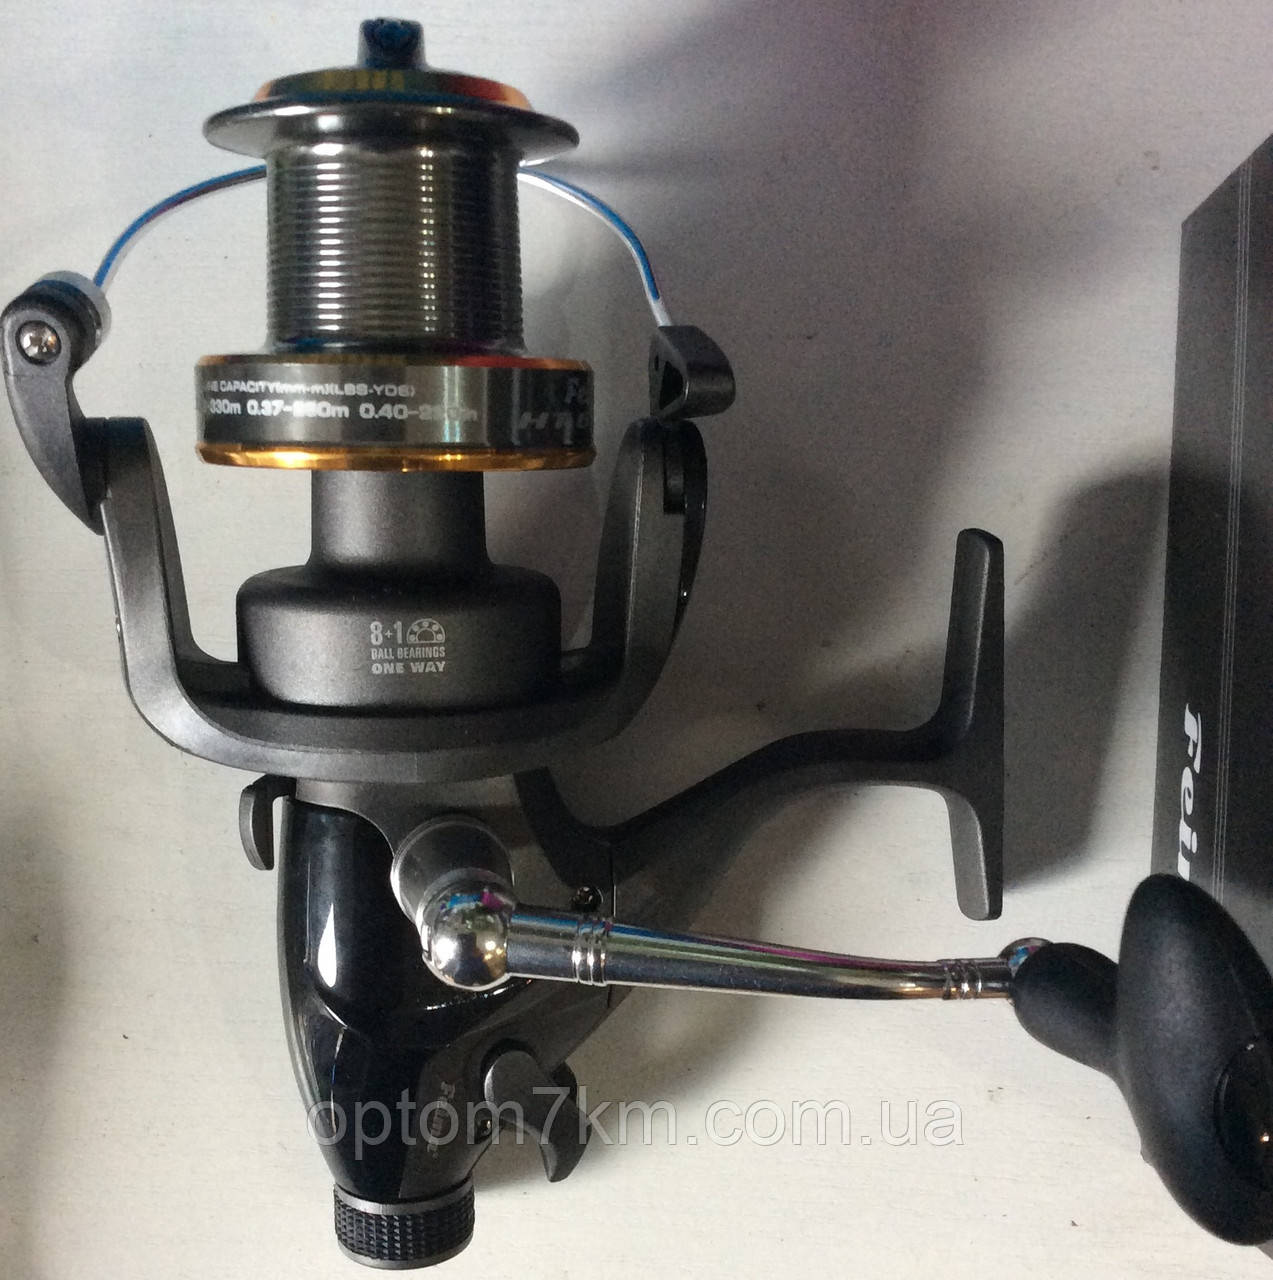 Катушка с байтранером Feima HT-6000, 8+1bb мет